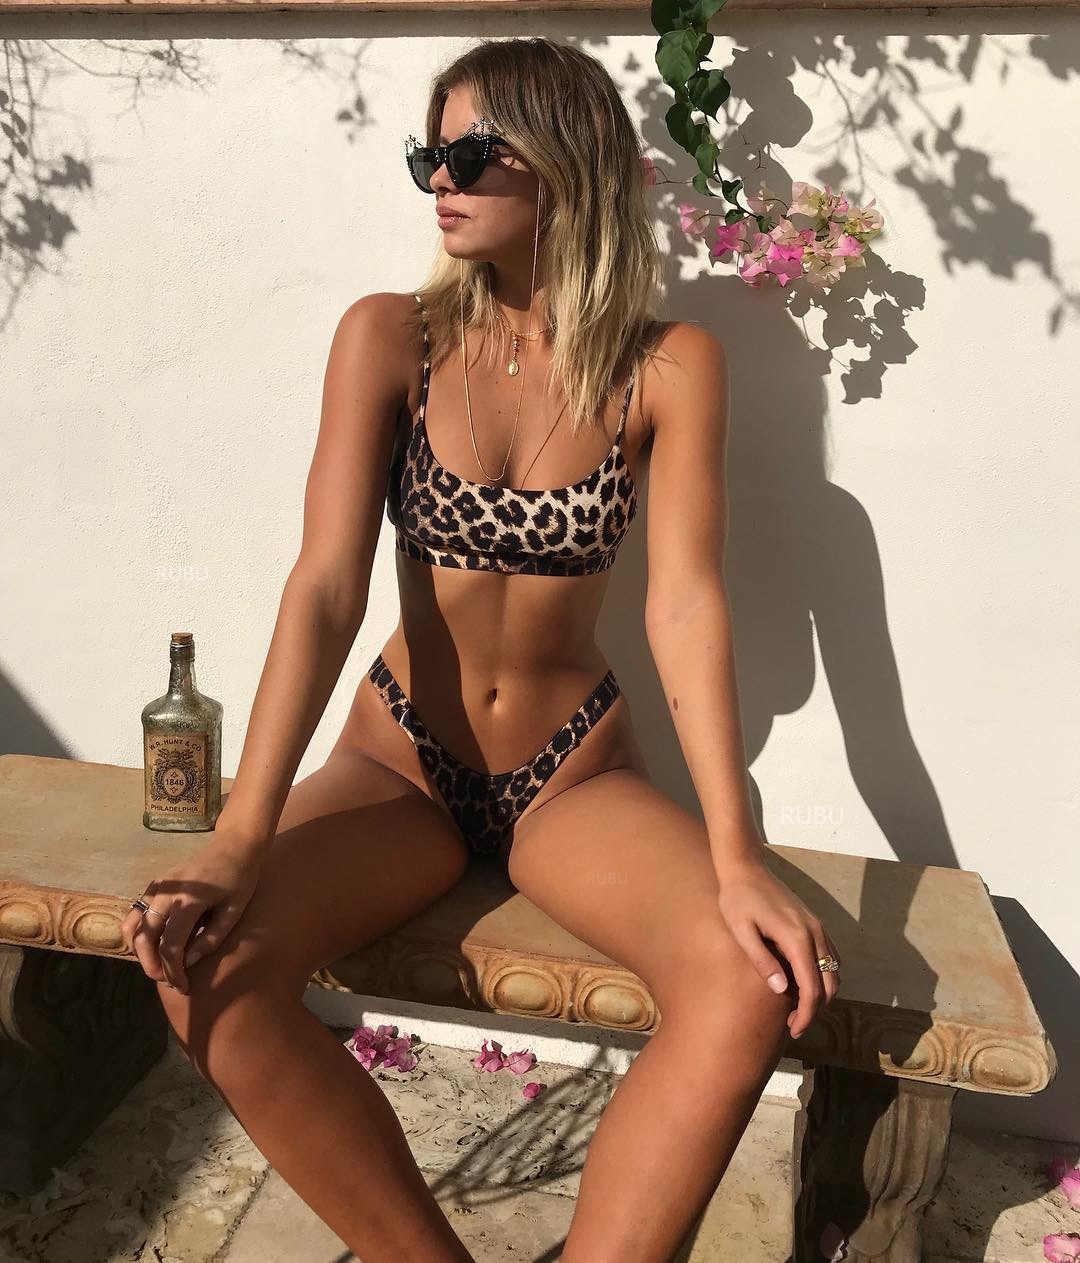 Leopard Serpentine Print Bikini Sets Gewatteerde Vrouwelijke Badpak Bikini Sexy Vrouwen Badmode Lage Taille Zwemmen Badpak Zomer